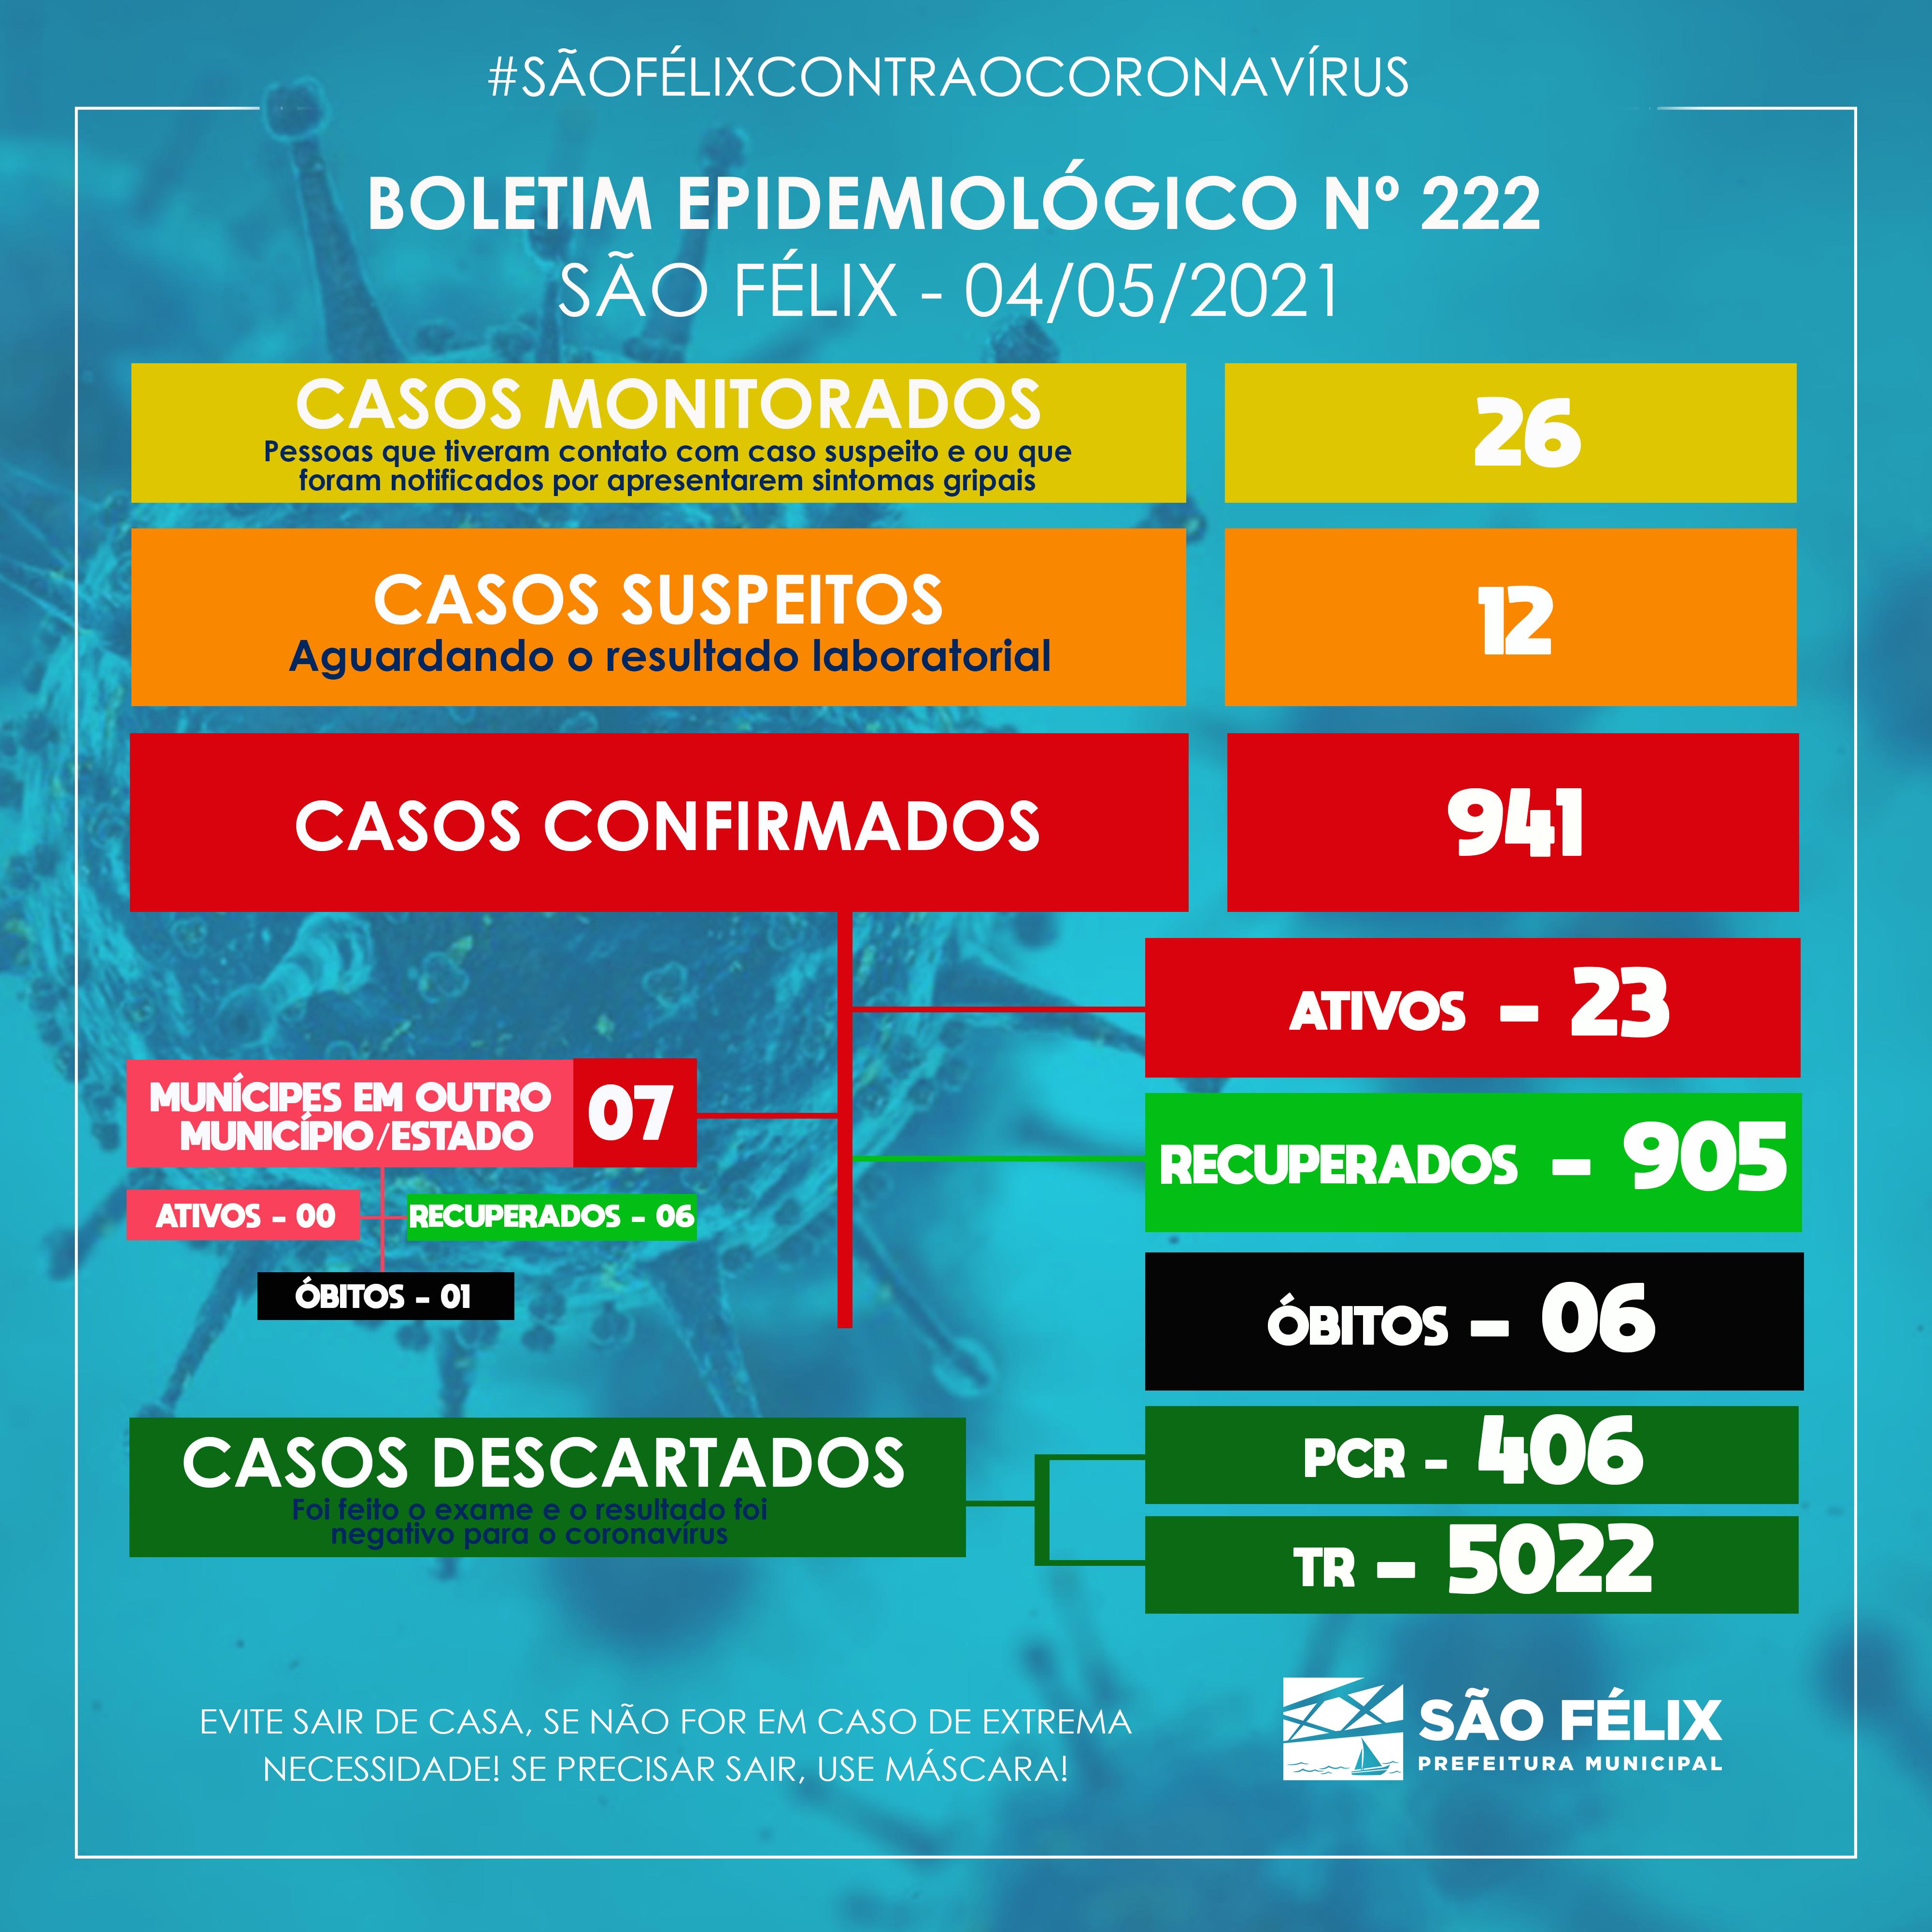 BOLETIM EPIDEMIOLÓGICO Nº 222